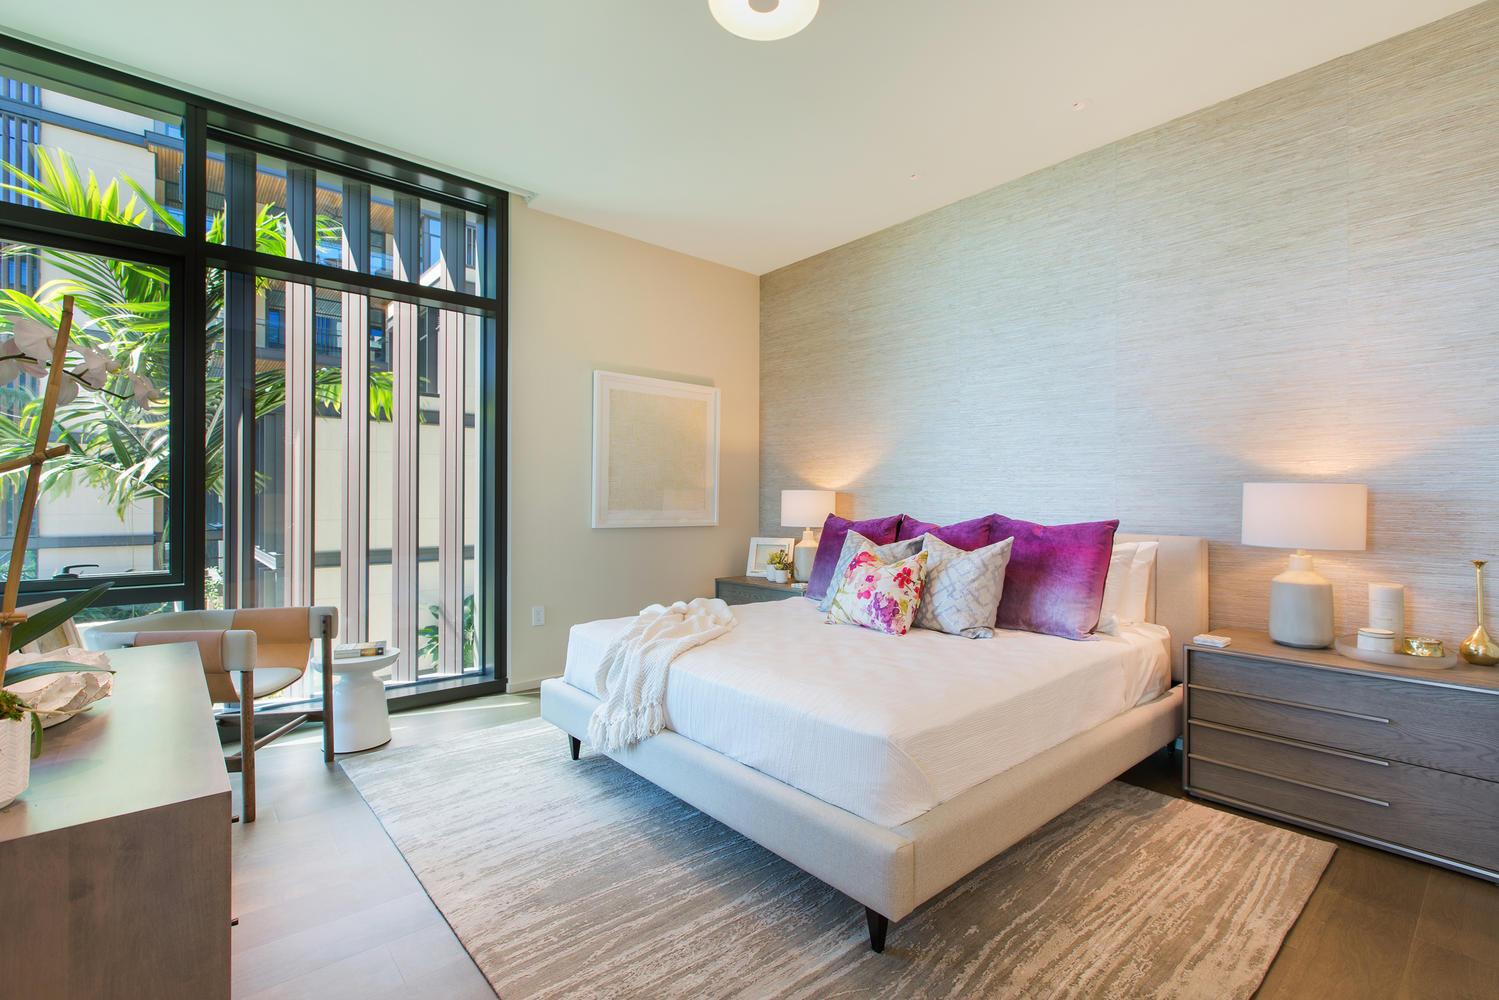 1388 Ala Moana Blvd 7401-large-018-14-Bedroom Suite 2-1500x1000-72dpi.jpg